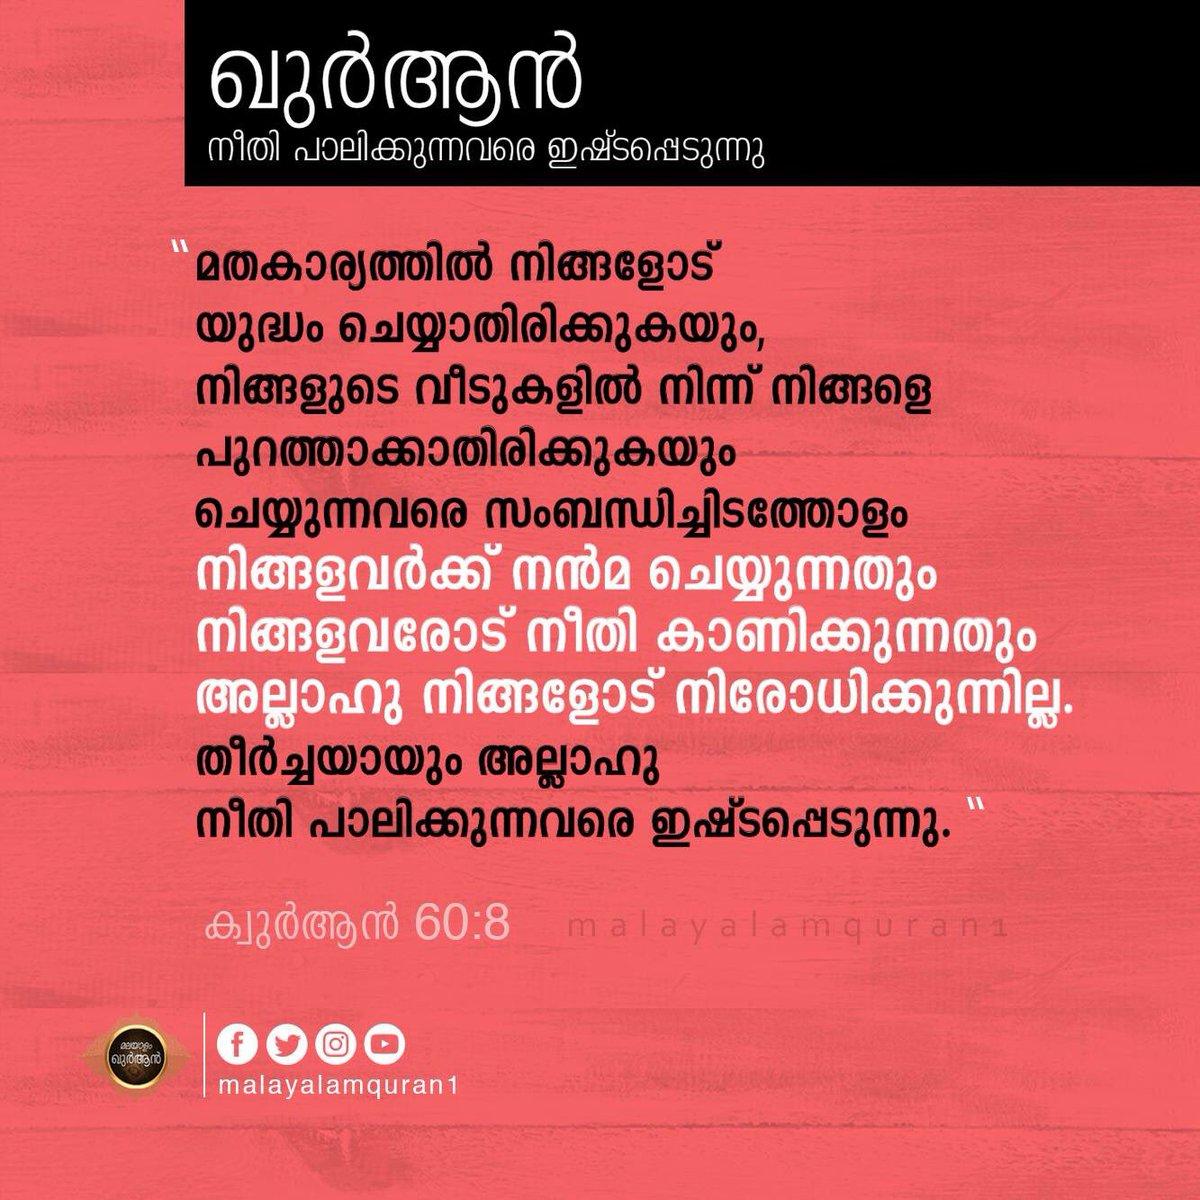 Malayalam Quran on Twitter: